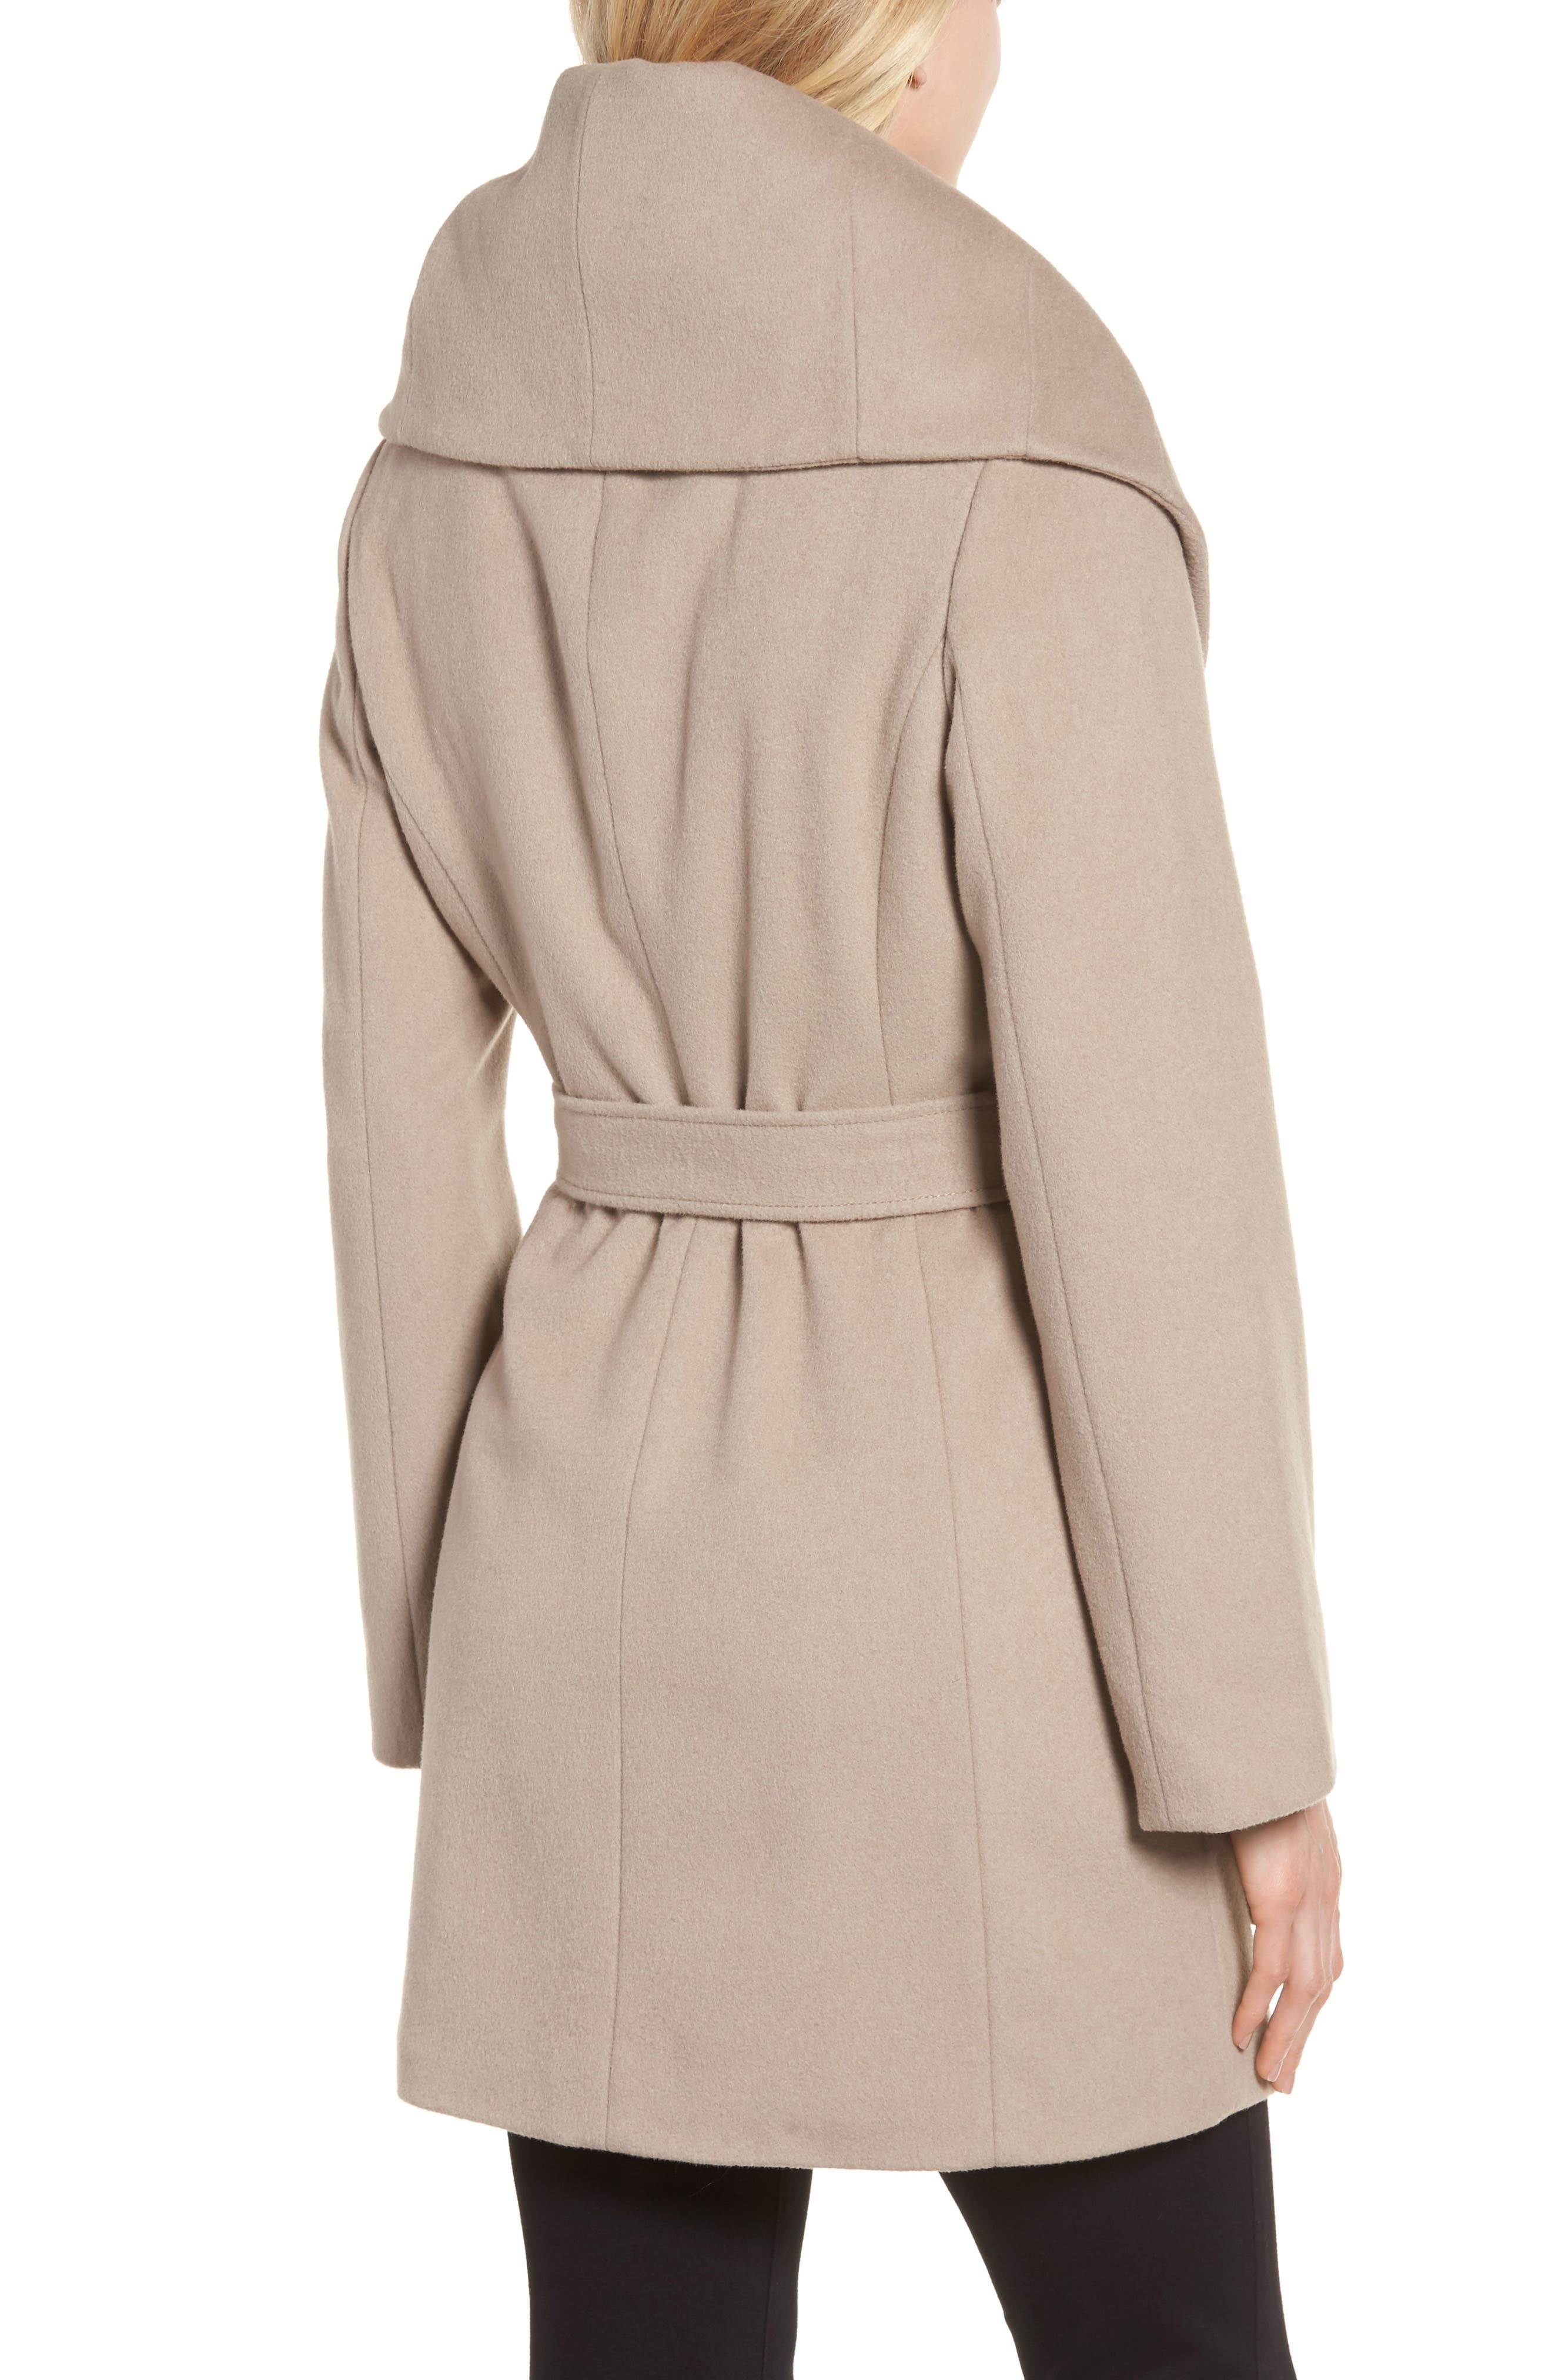 T Tahari Wool Blend Belted Wrap Coat,                             Alternate thumbnail 13, color,